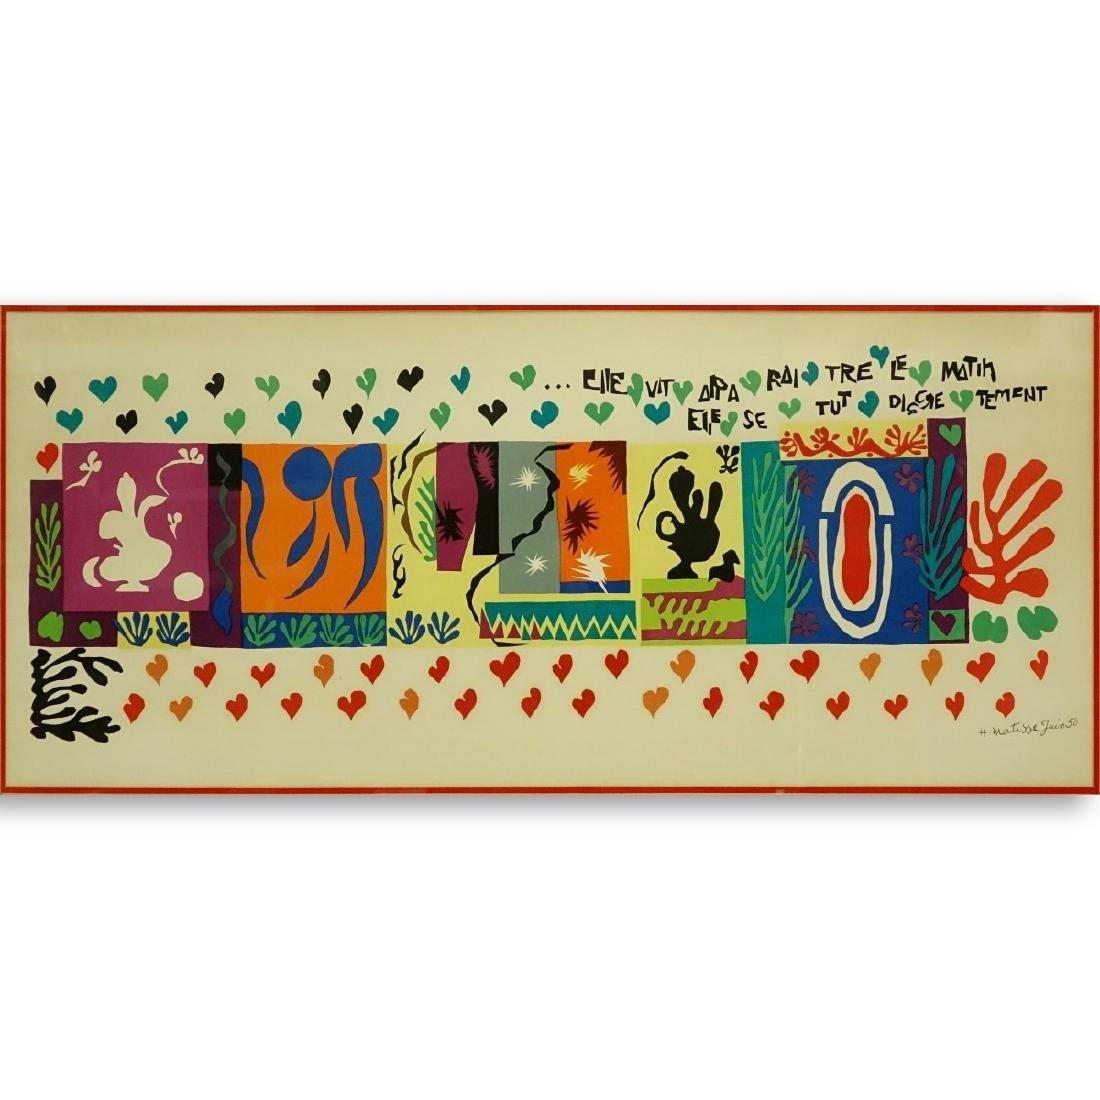 Henri Matisse, French (1869 - 1954) Lithograph